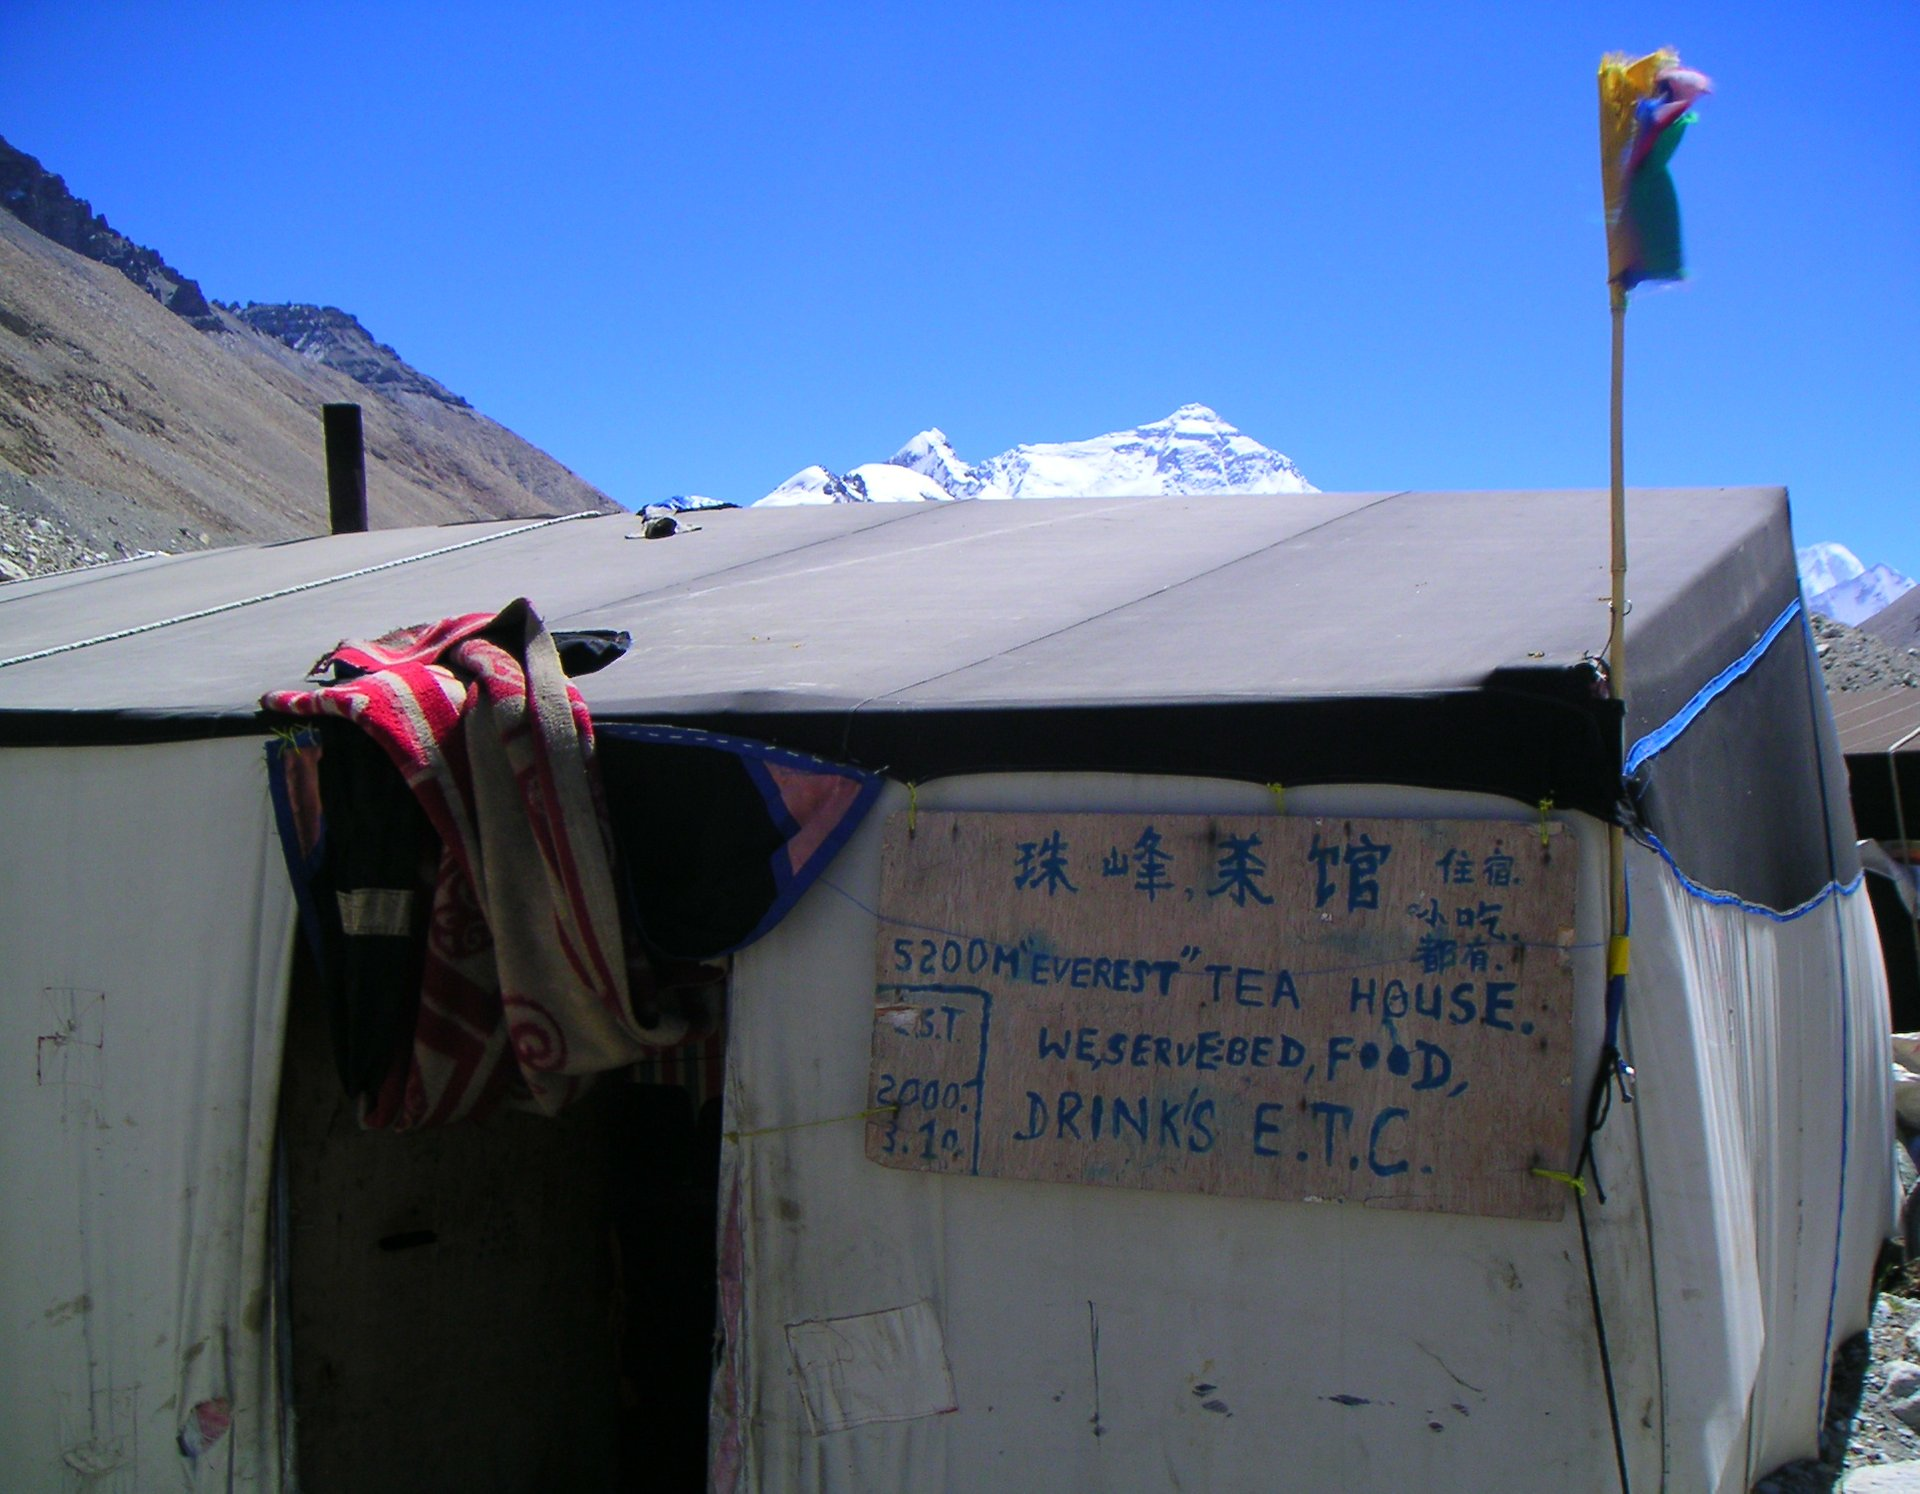 Tea house at North Mount Everest Base Camp 2020